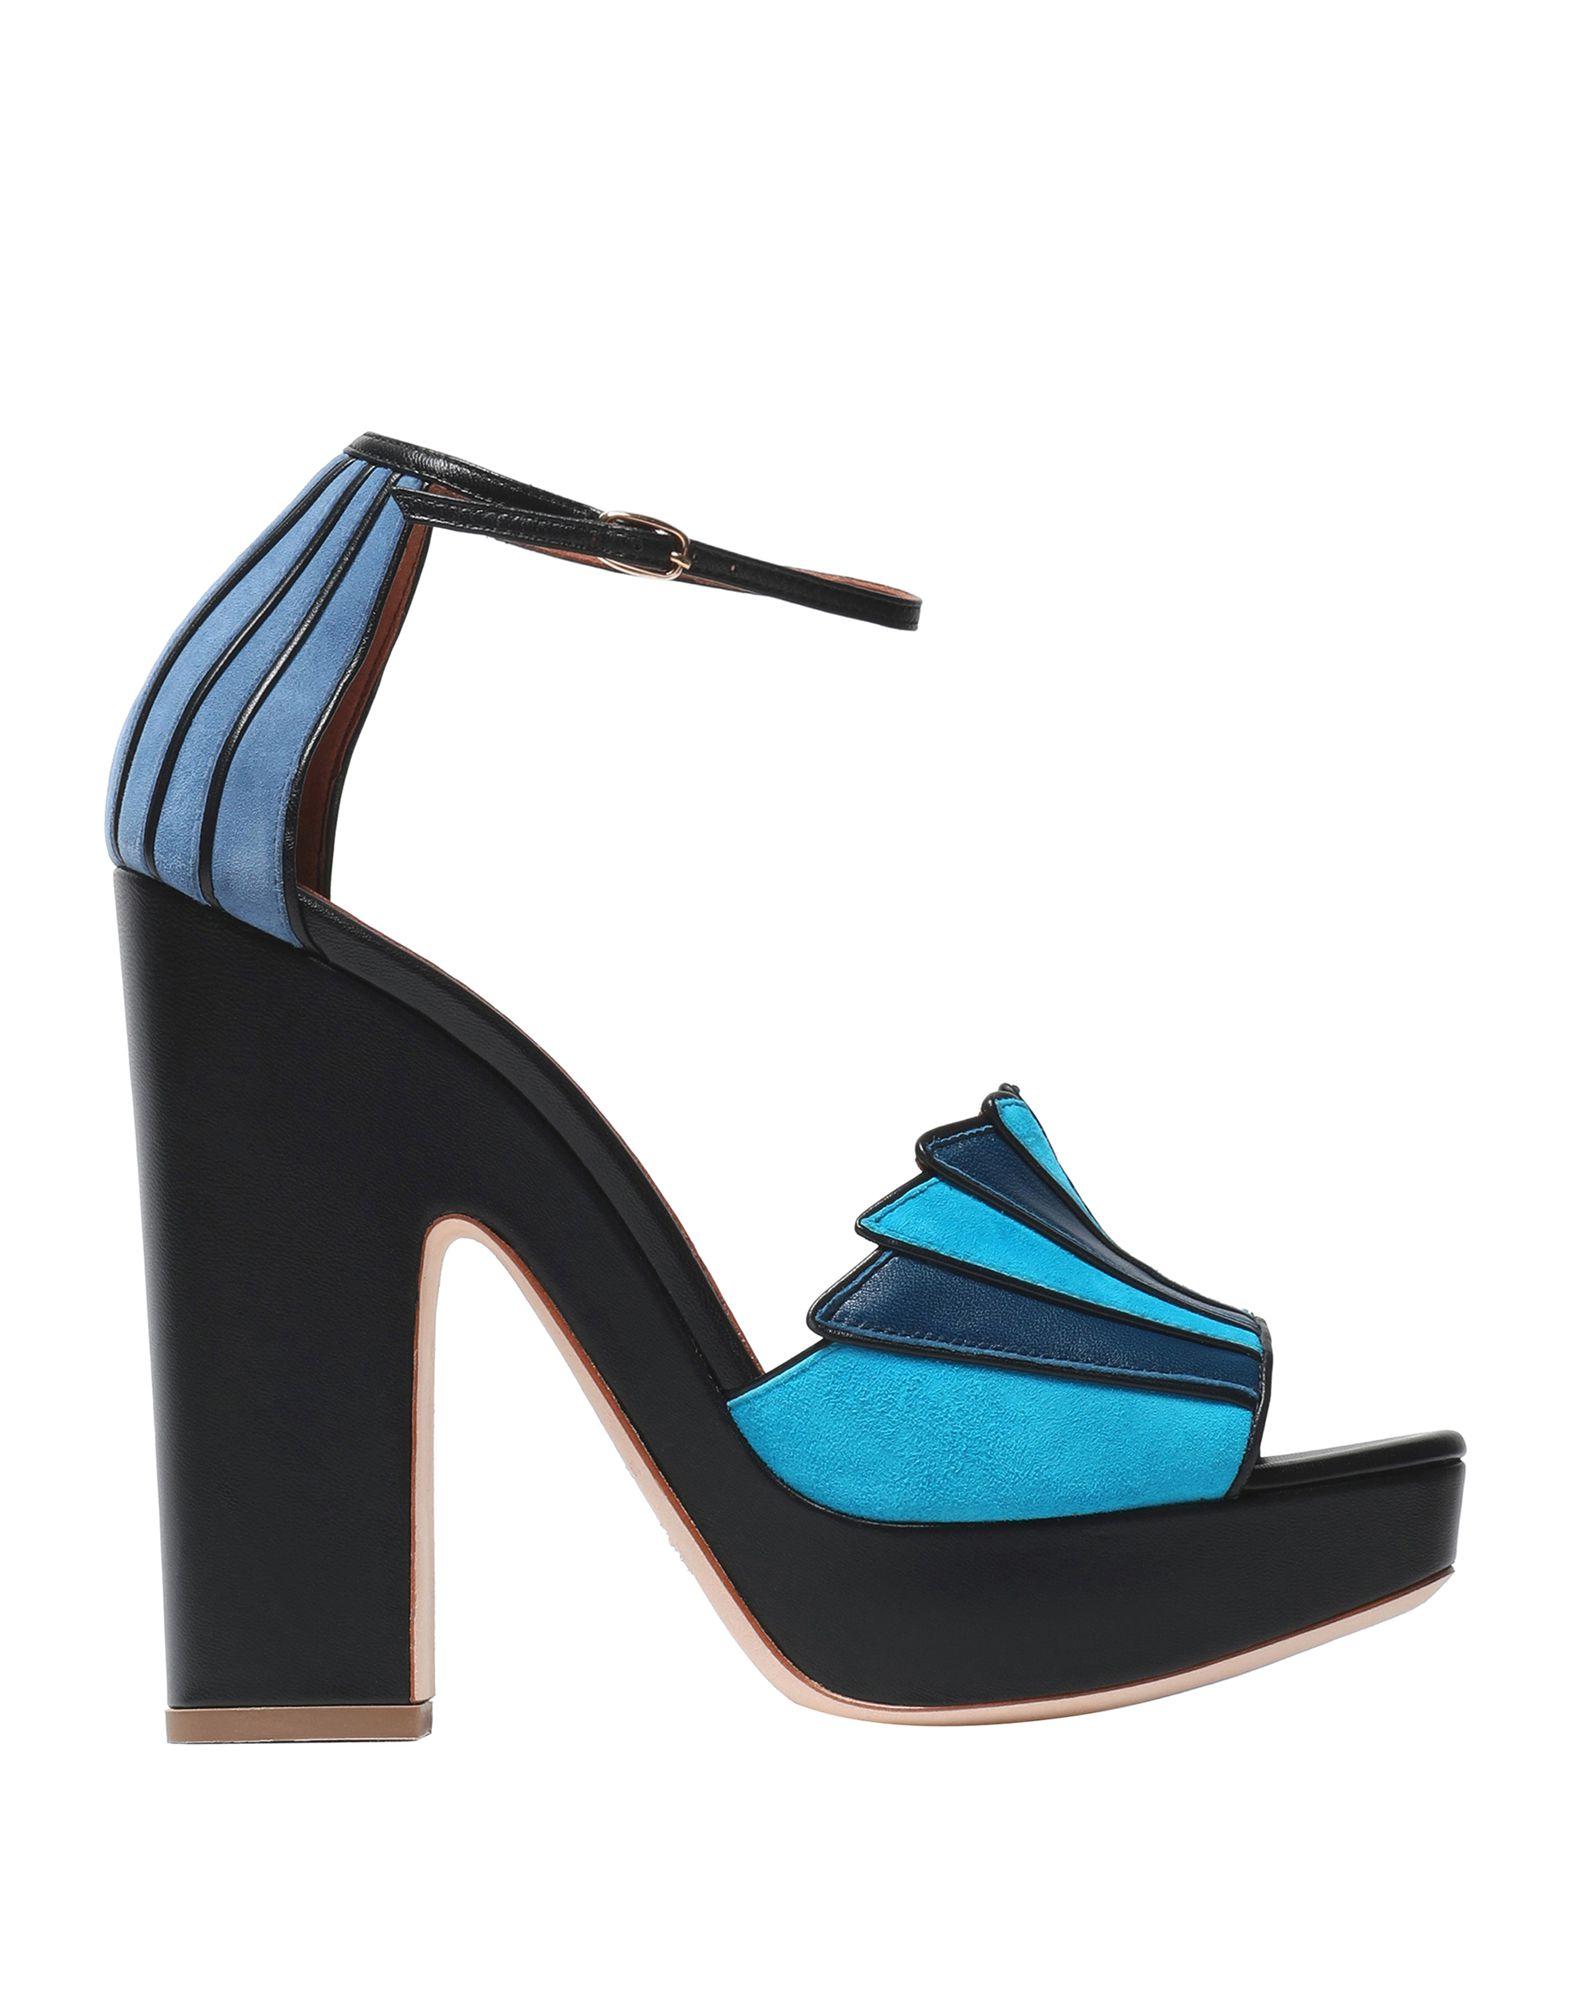 malone souliers sandales - femmes malone souliers sandales sur en ligne sur sandales canada - 11586788po 41cf85